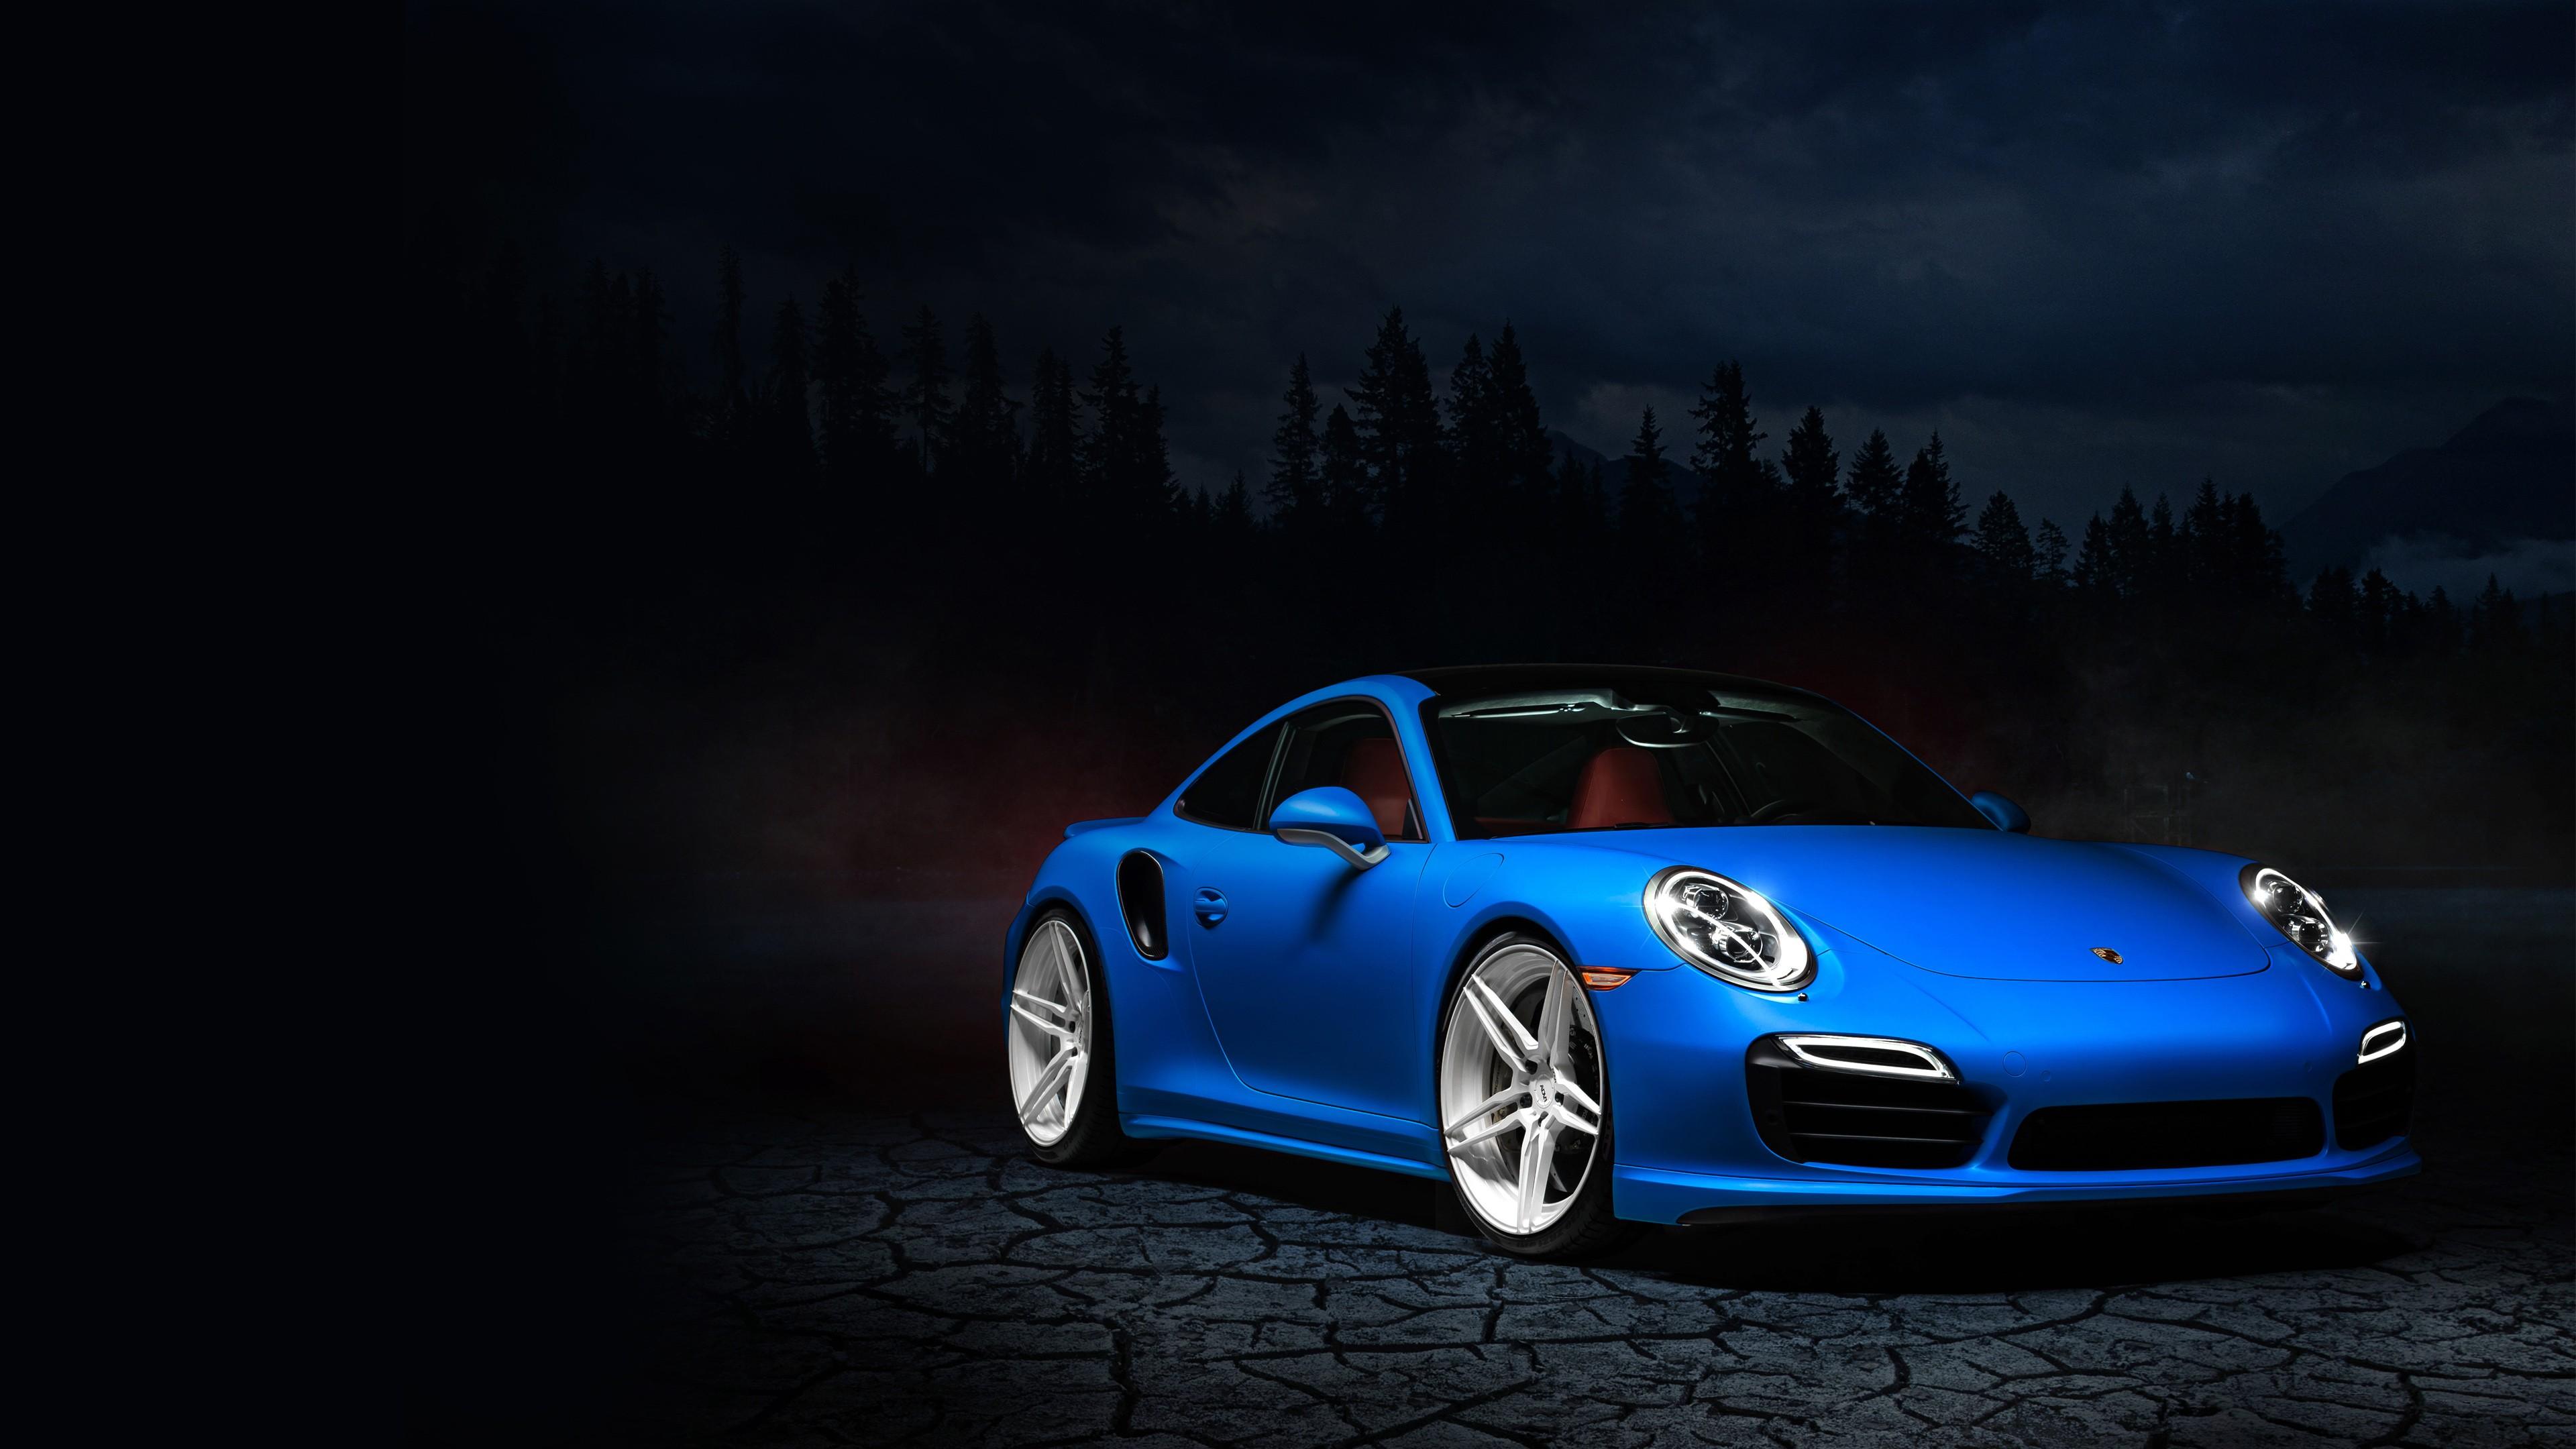 Adv1+Car+Wallpaper ADV1 Porsche 991 Wallpaper | HD Car Wallpapers